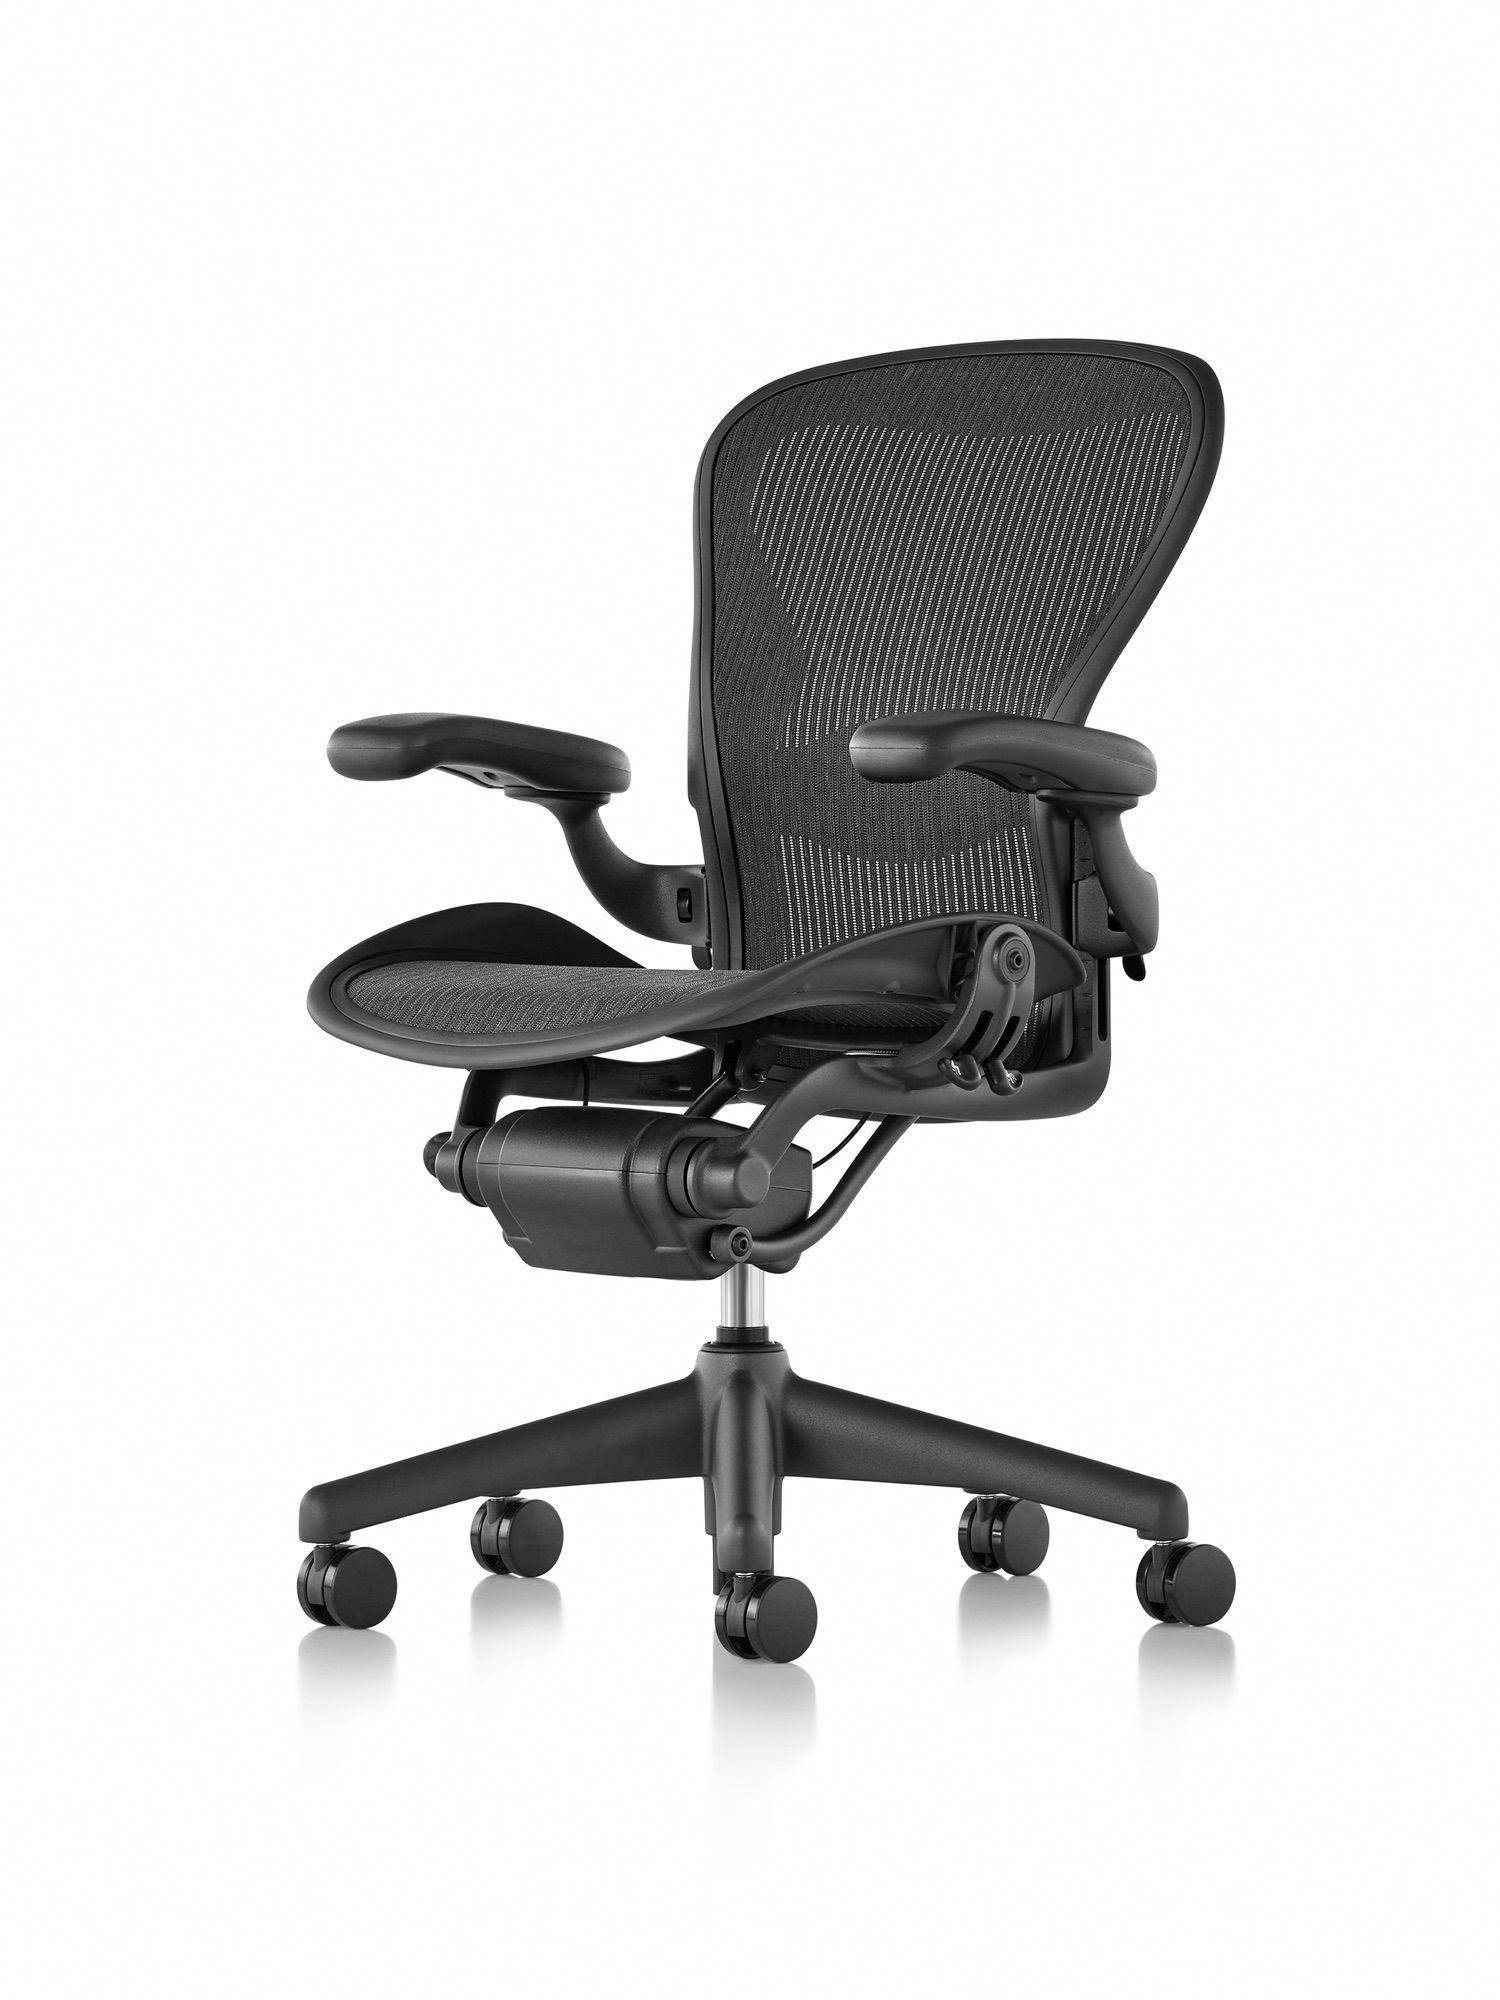 aeron chair sale ergonomic office chairs for classic bestofficechair salon